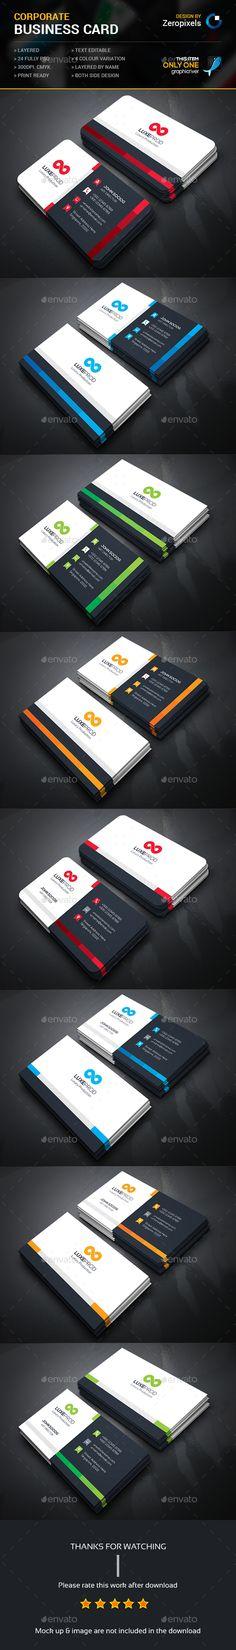 Corporate Business Card Bundle Templates PSD. Download here: http://graphicriver.net/item/corporate-business-card-bundle/16093646?ref=ksioks